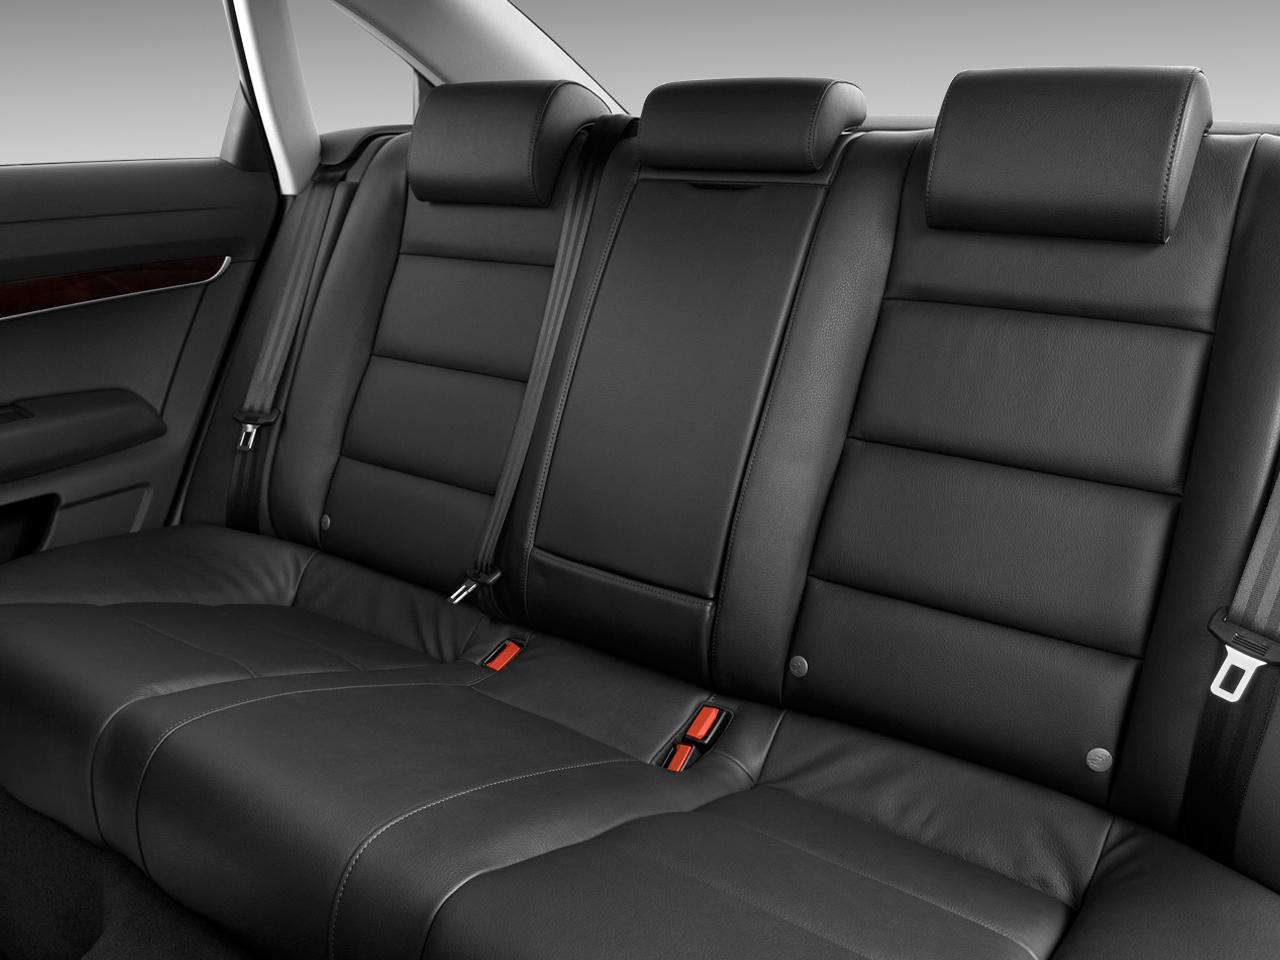 2009 Audi A6 3.0T - Audi Luxury Sedan Review - Automobile ...